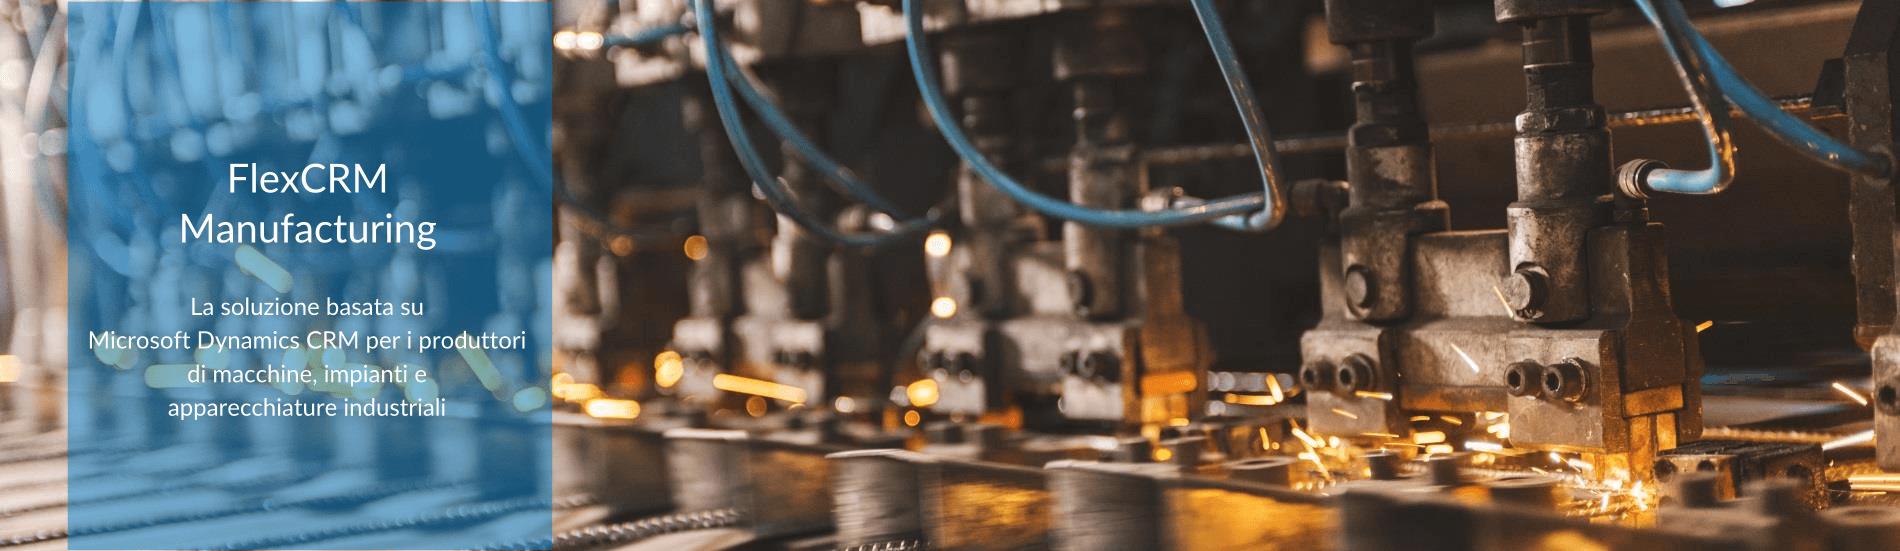 flexcrm manufacturing microsoft dynamics crm settore impianti e macchinari